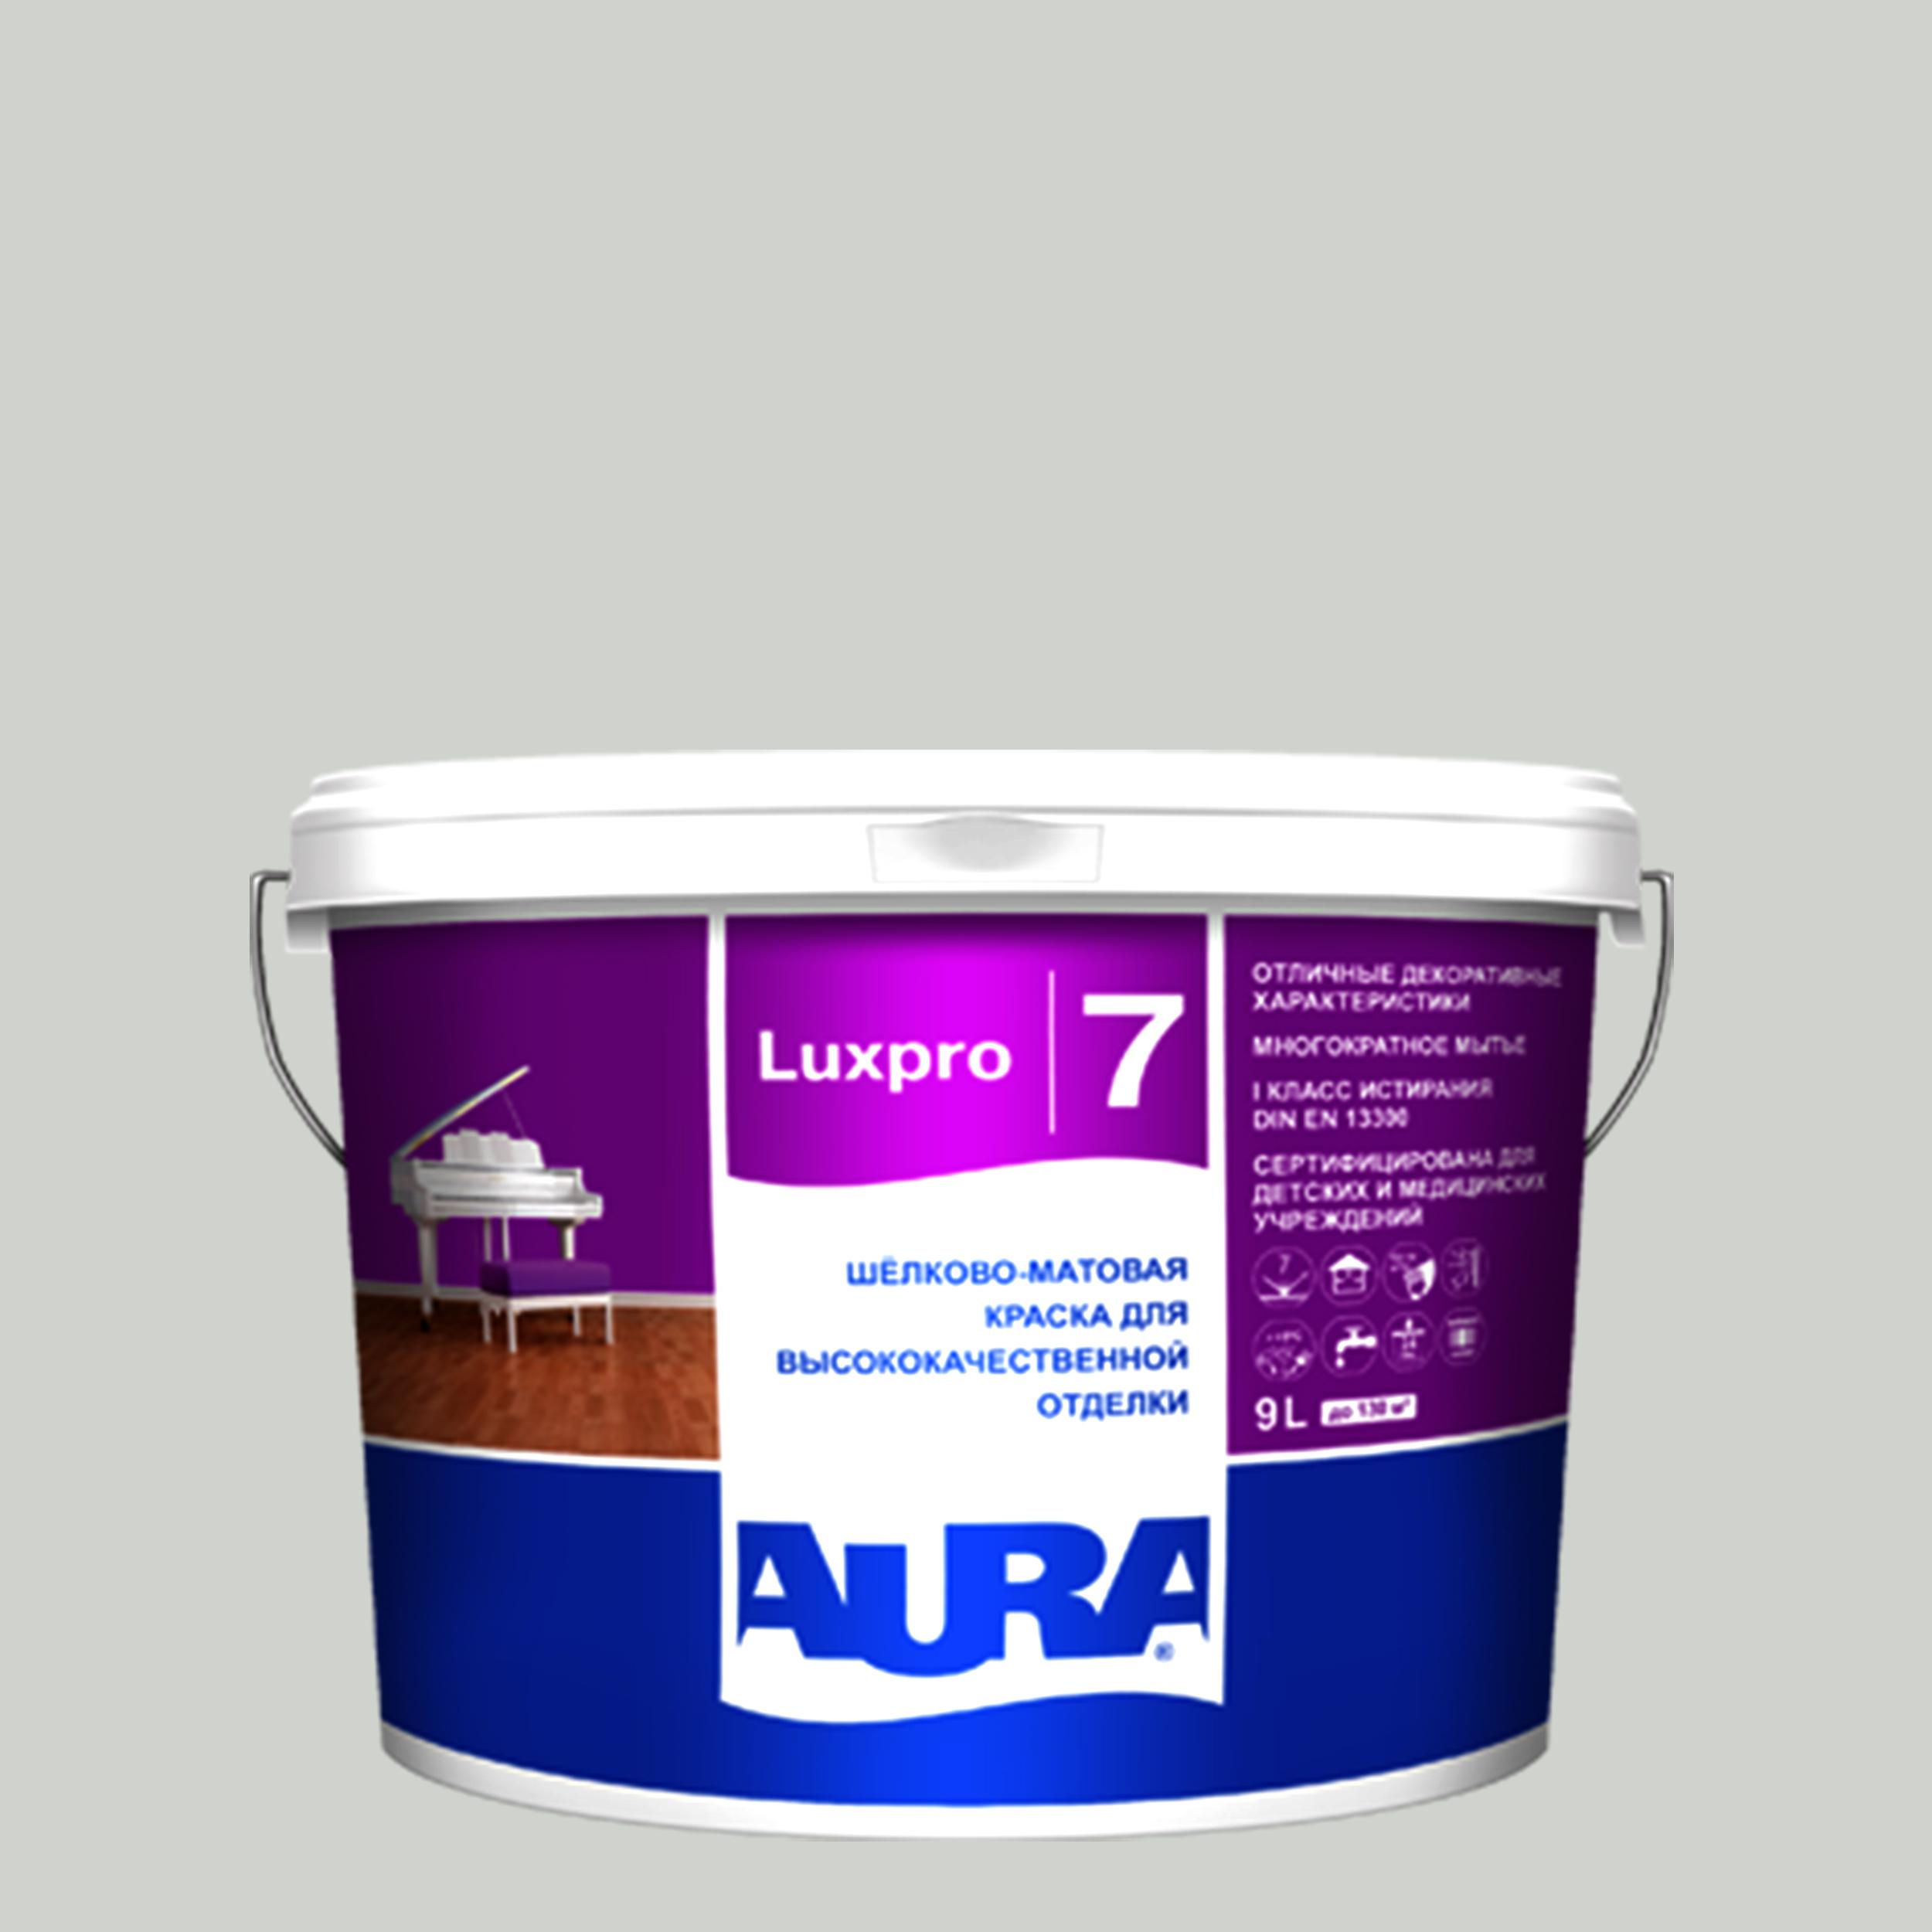 Фото 5 - Краска интерьерная, Aura LuxPRO 7, RAL 6026, 11 кг.